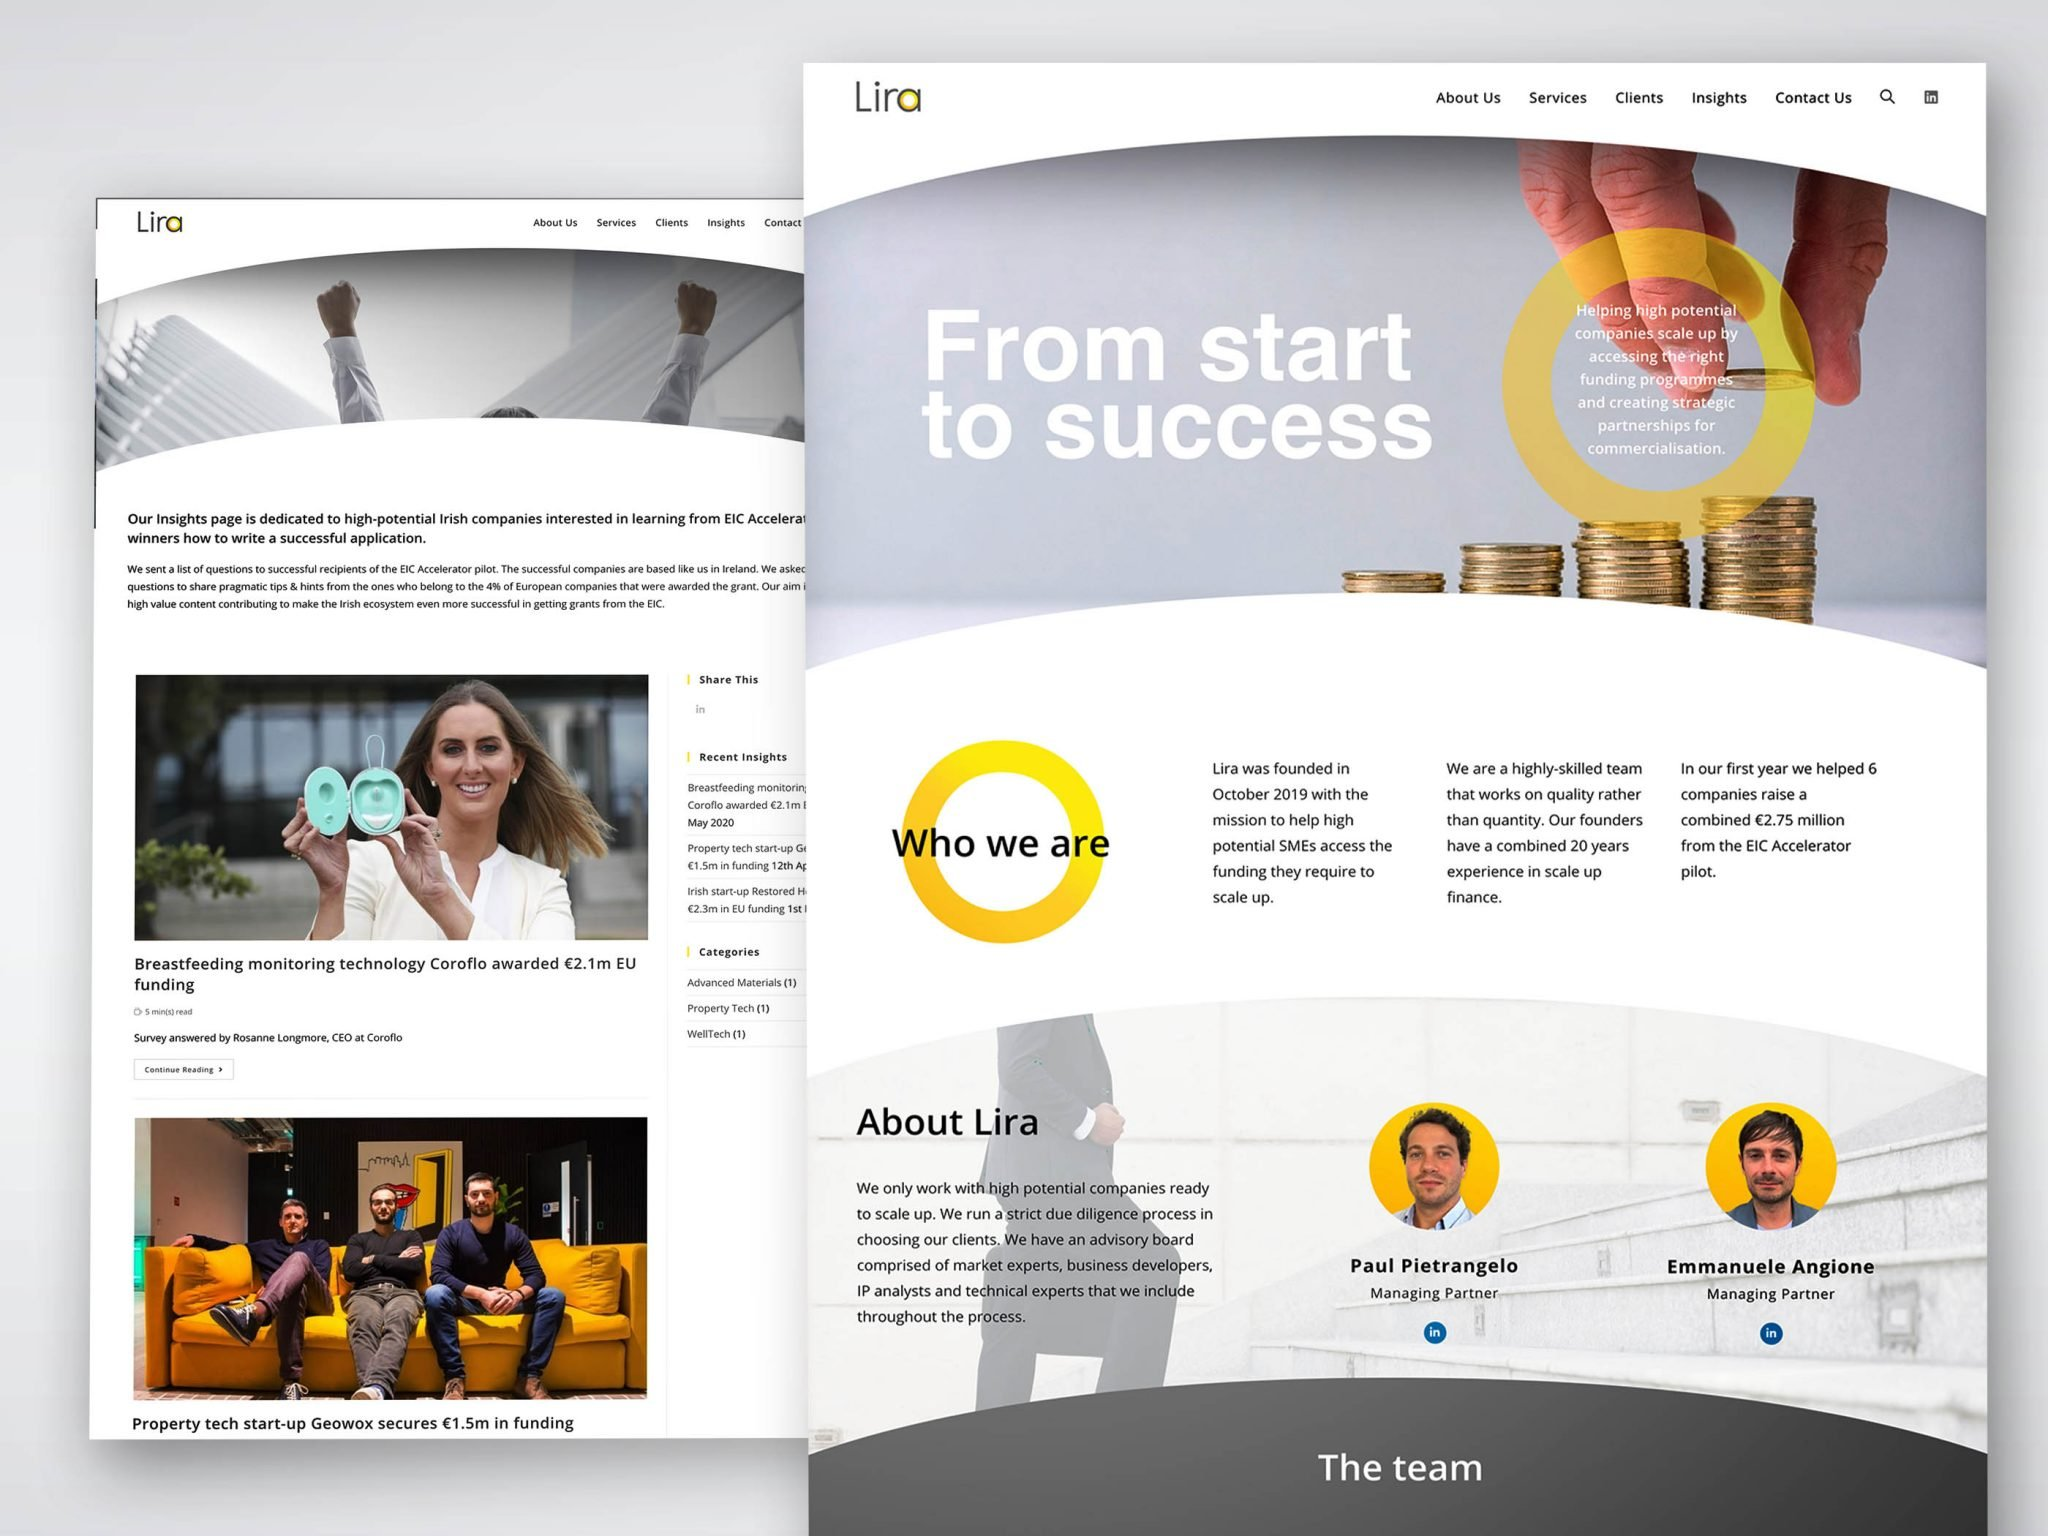 lira-web-design